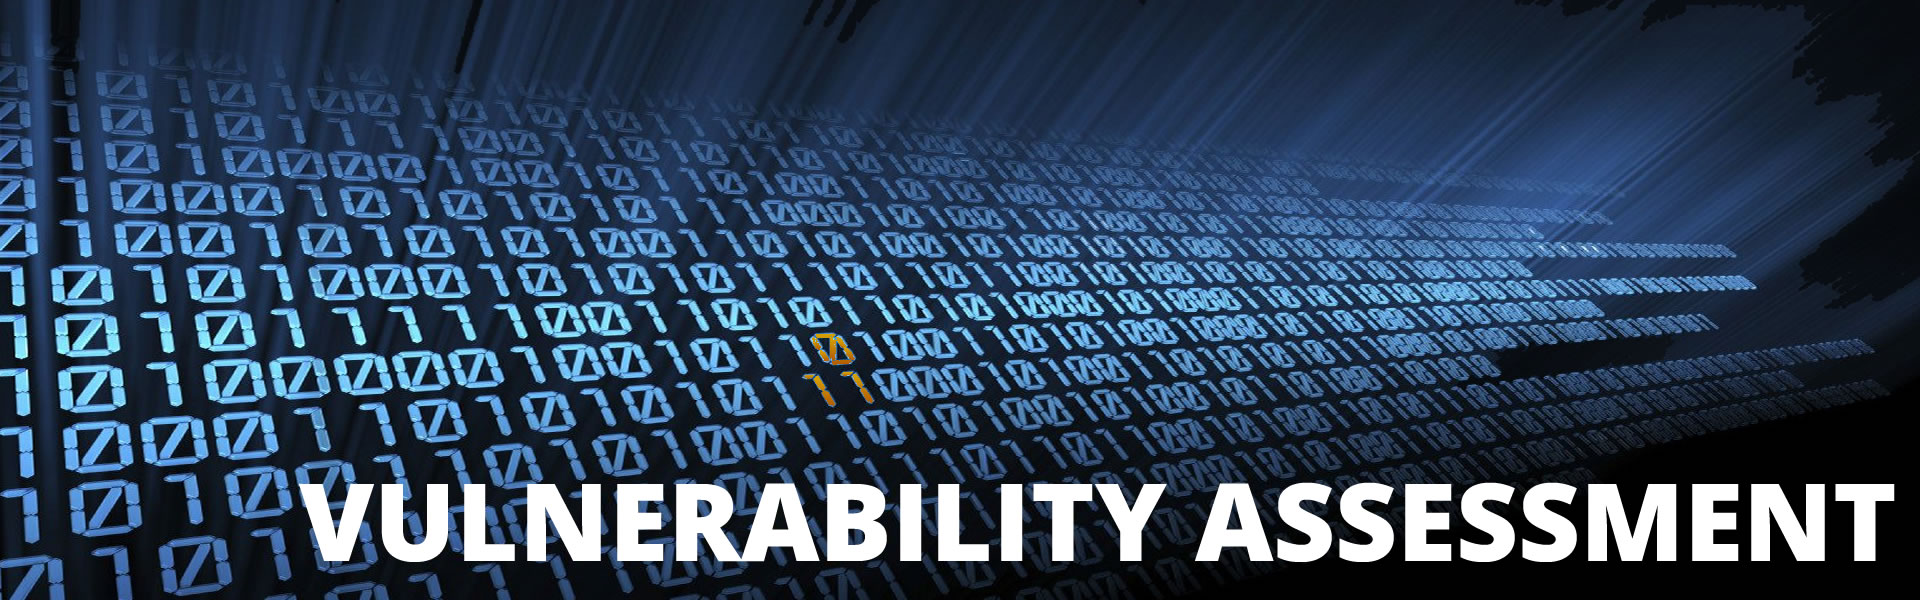 vulnerability-assessment